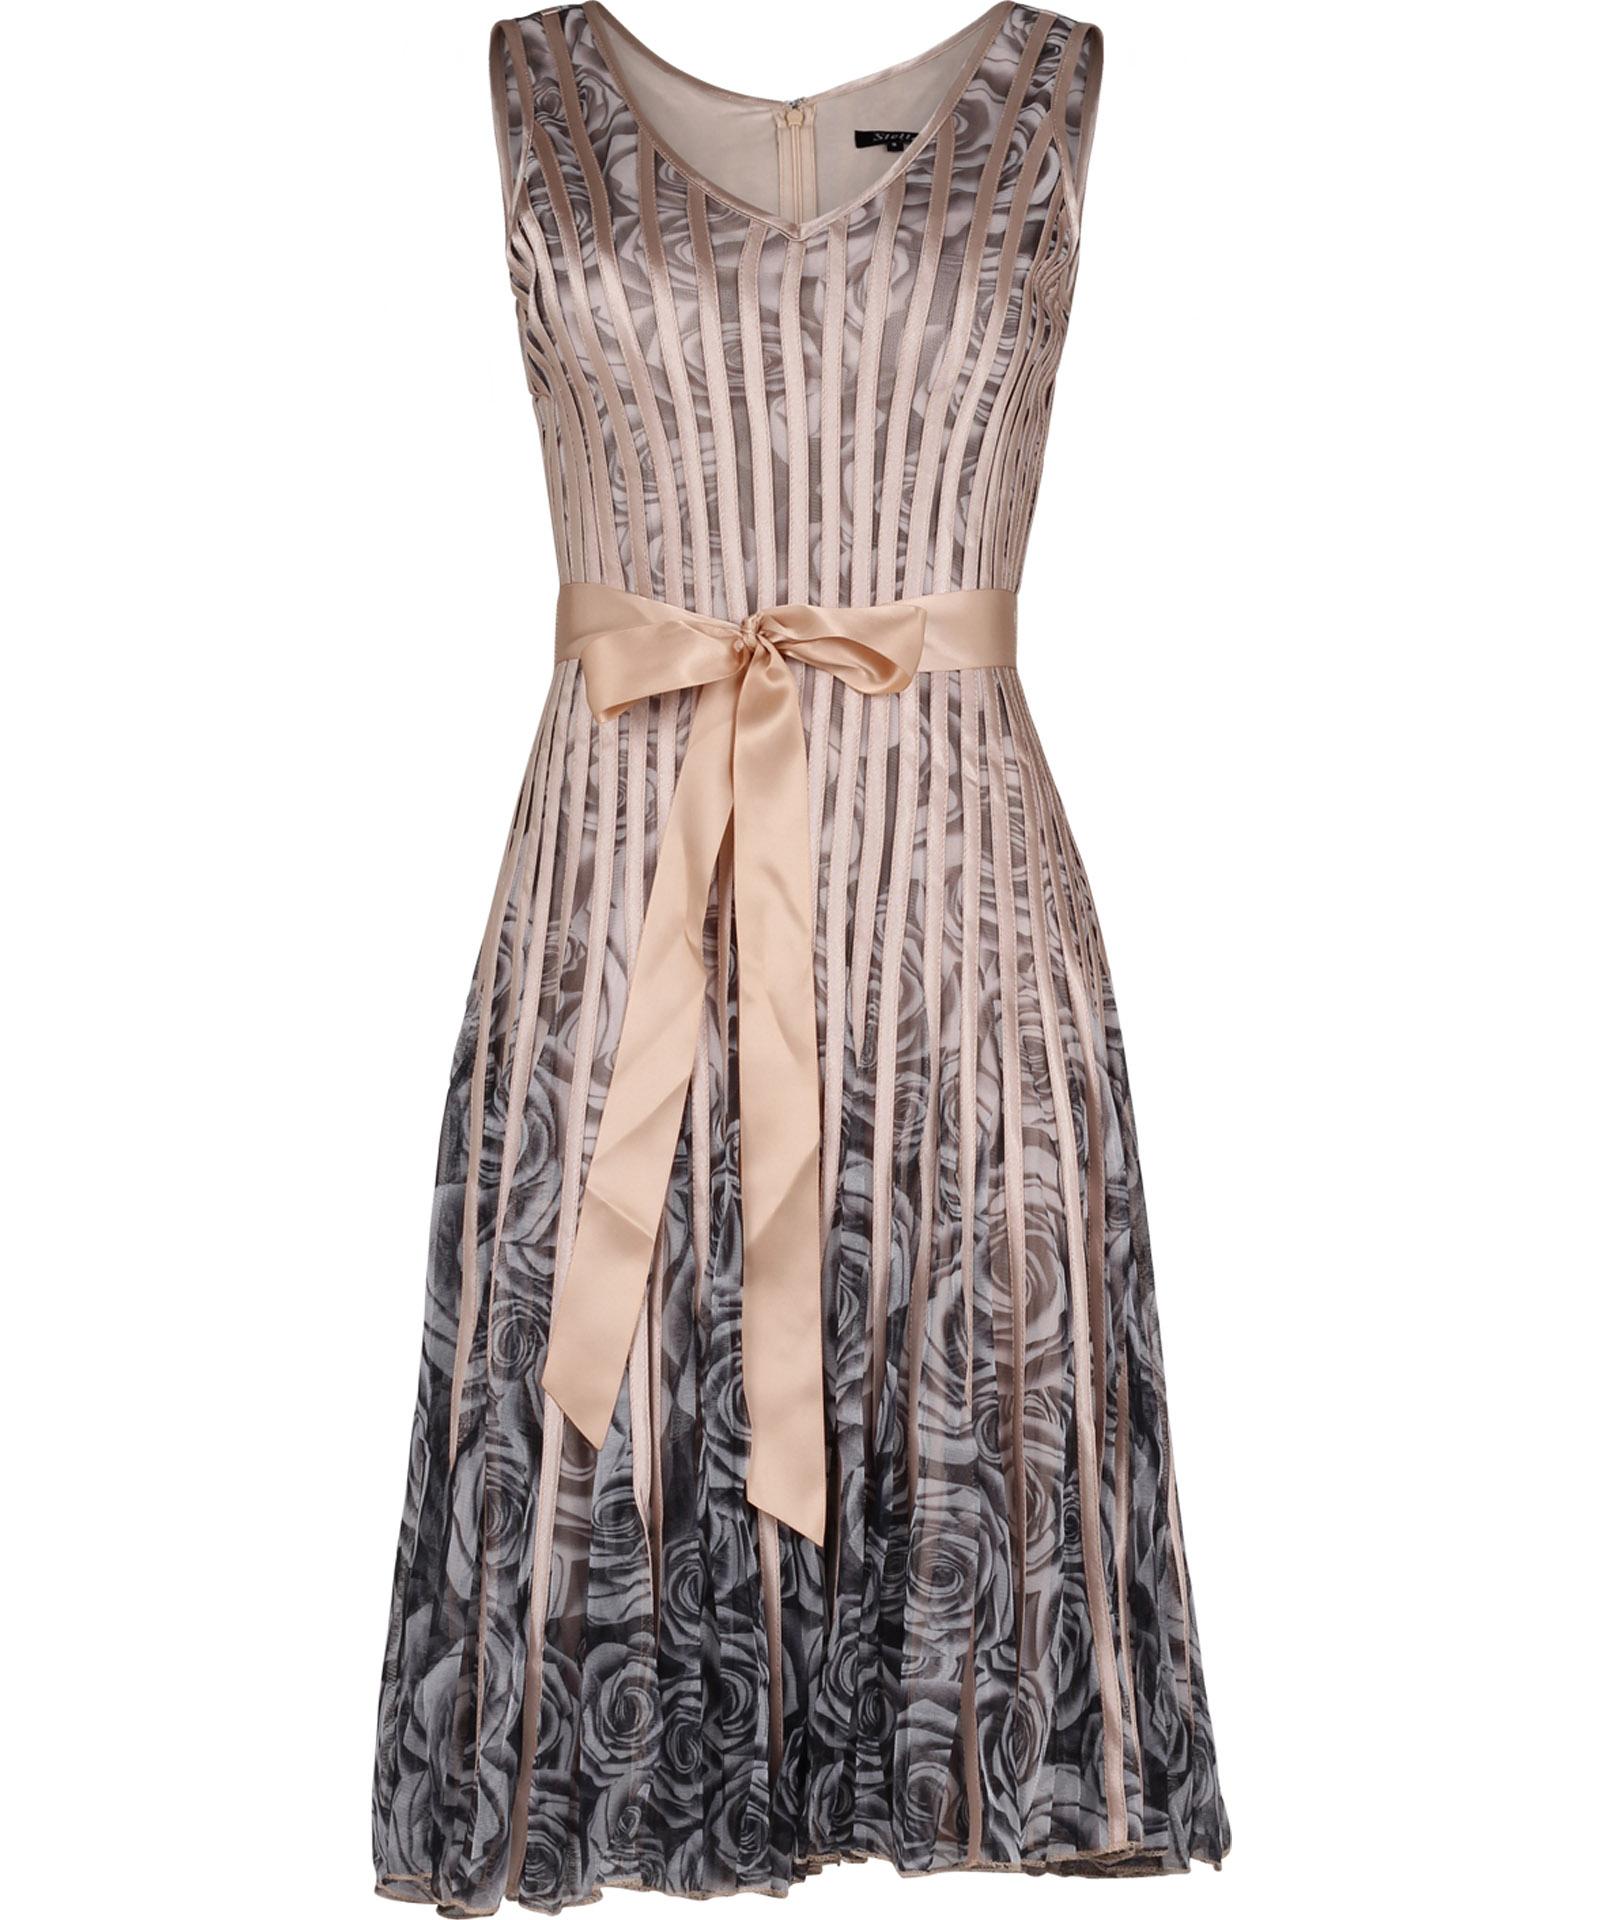 View Item Luxe Ribbon / Rose Chiffon Panel Evening Dress